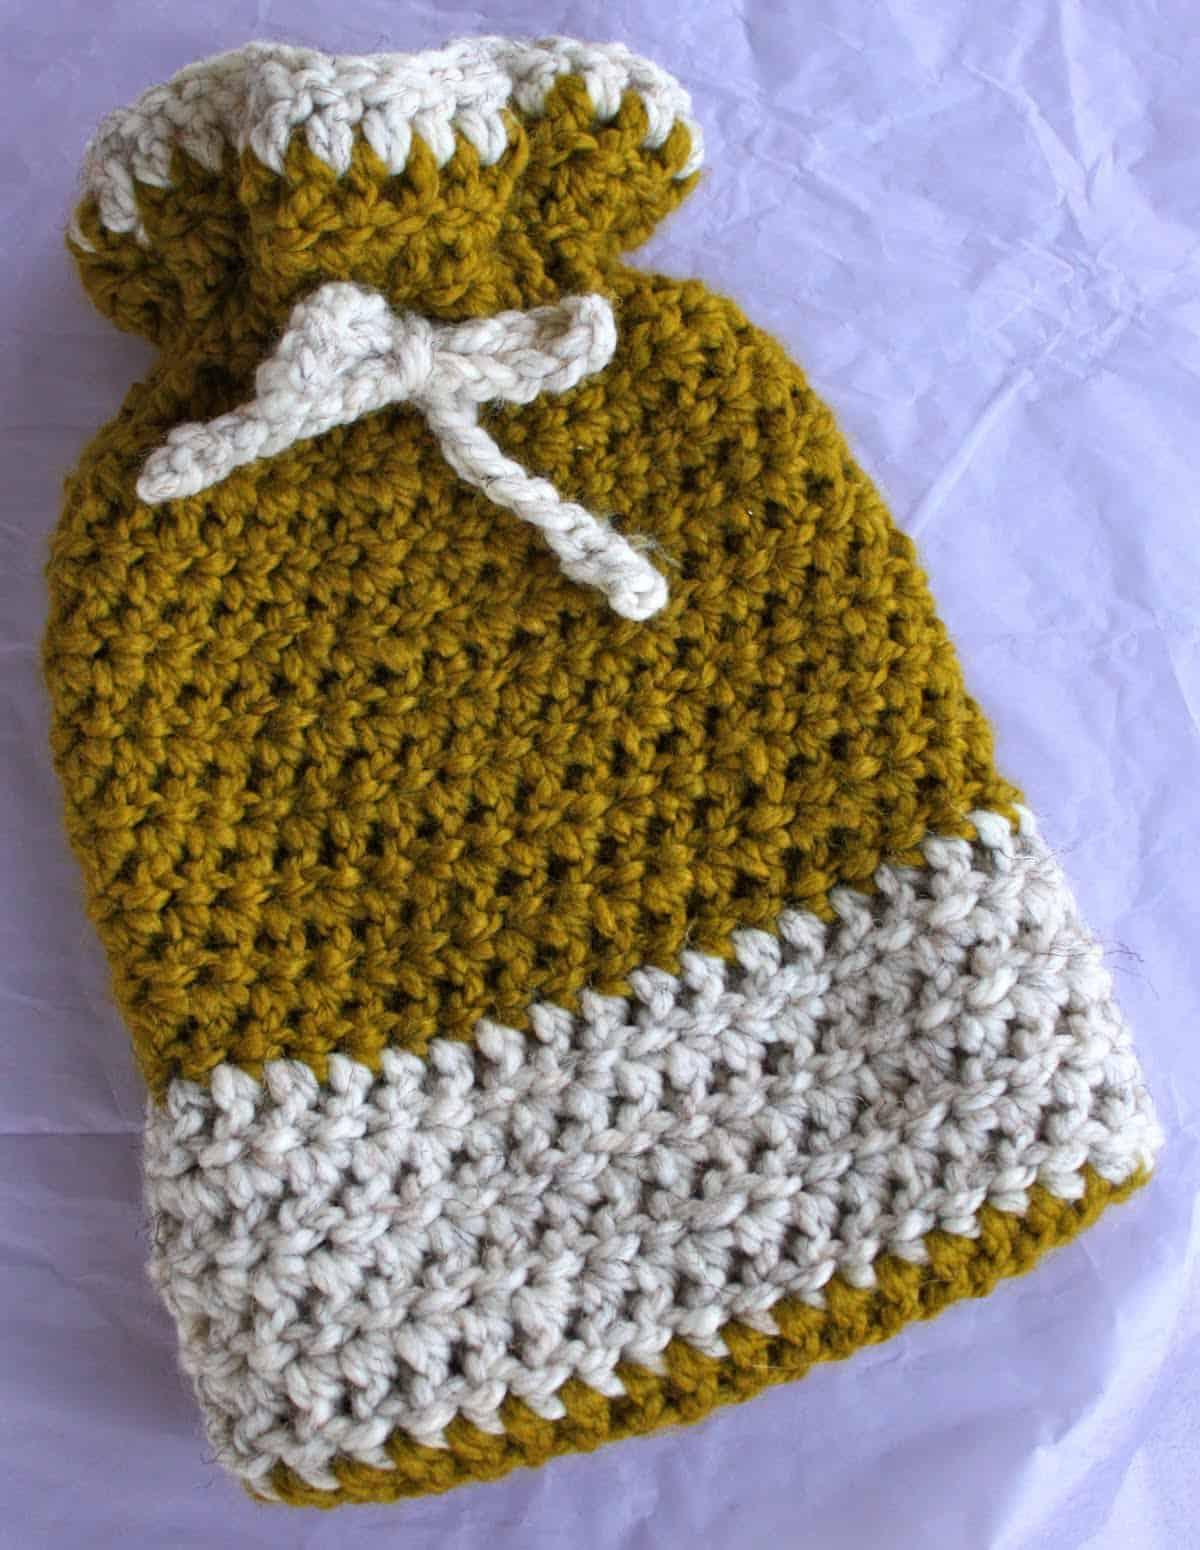 Crochet hot water bottle cozy pretty prudent crochet hot water bottle cozy bankloansurffo Choice Image